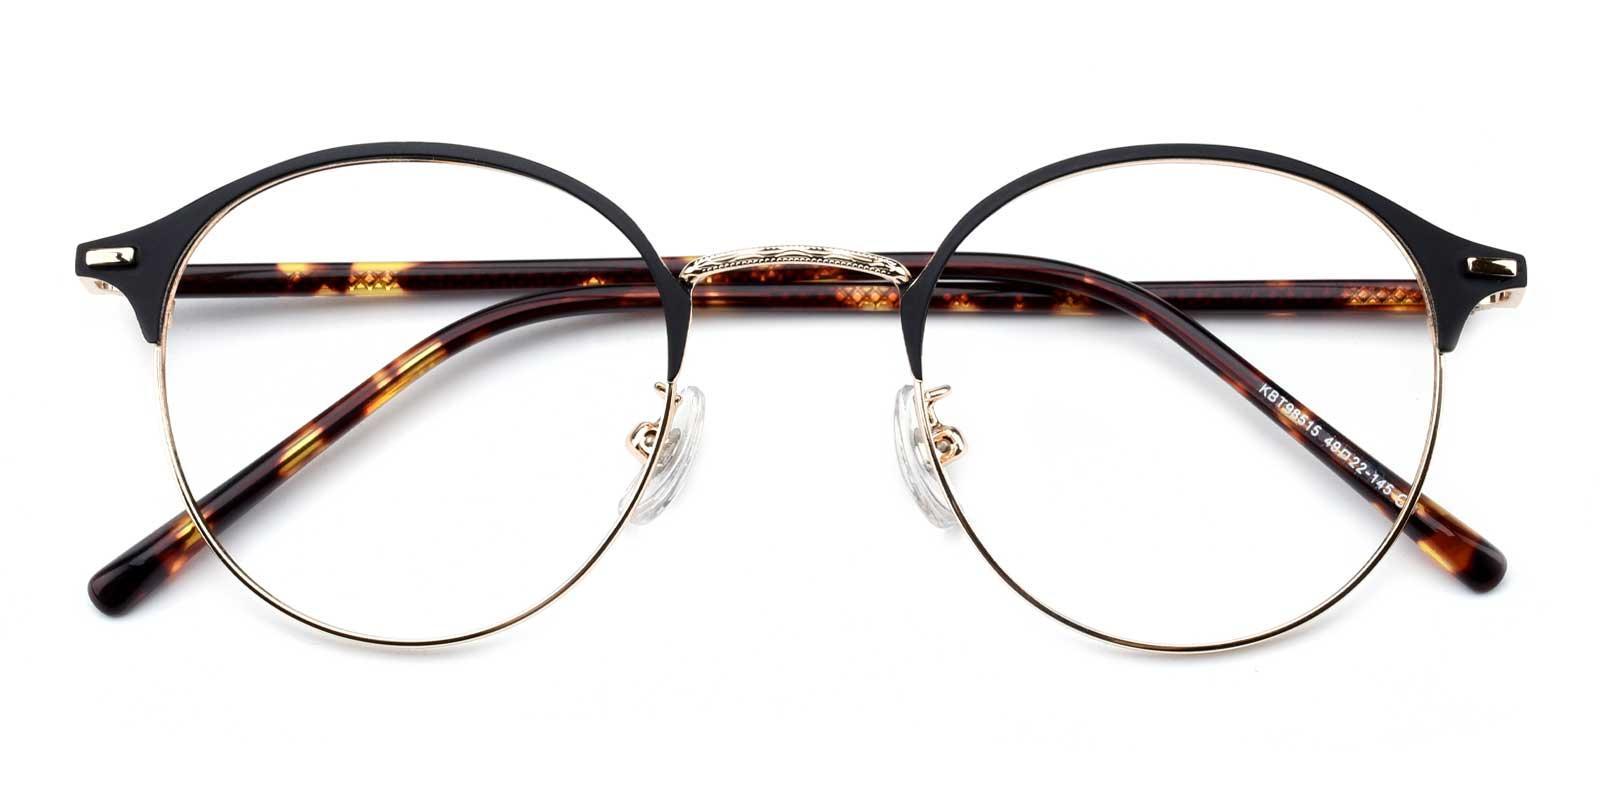 Evelyn-Tortoise-Round-Metal-Eyeglasses-detail